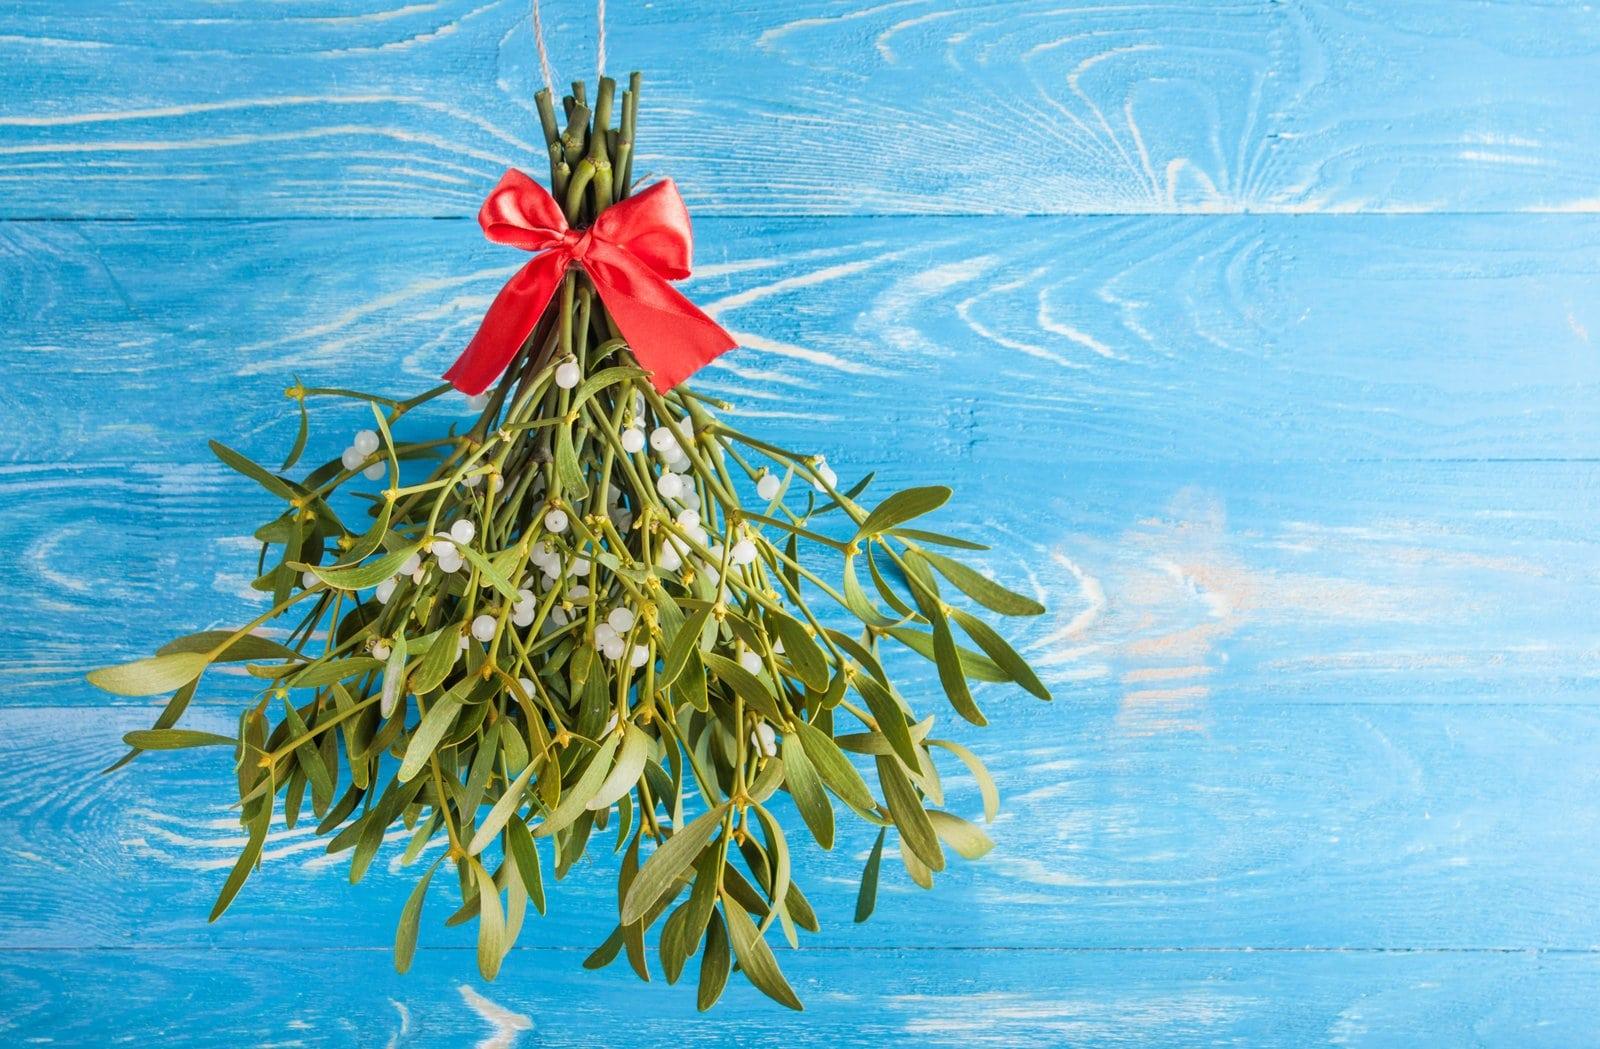 Is mistletoe poisonous